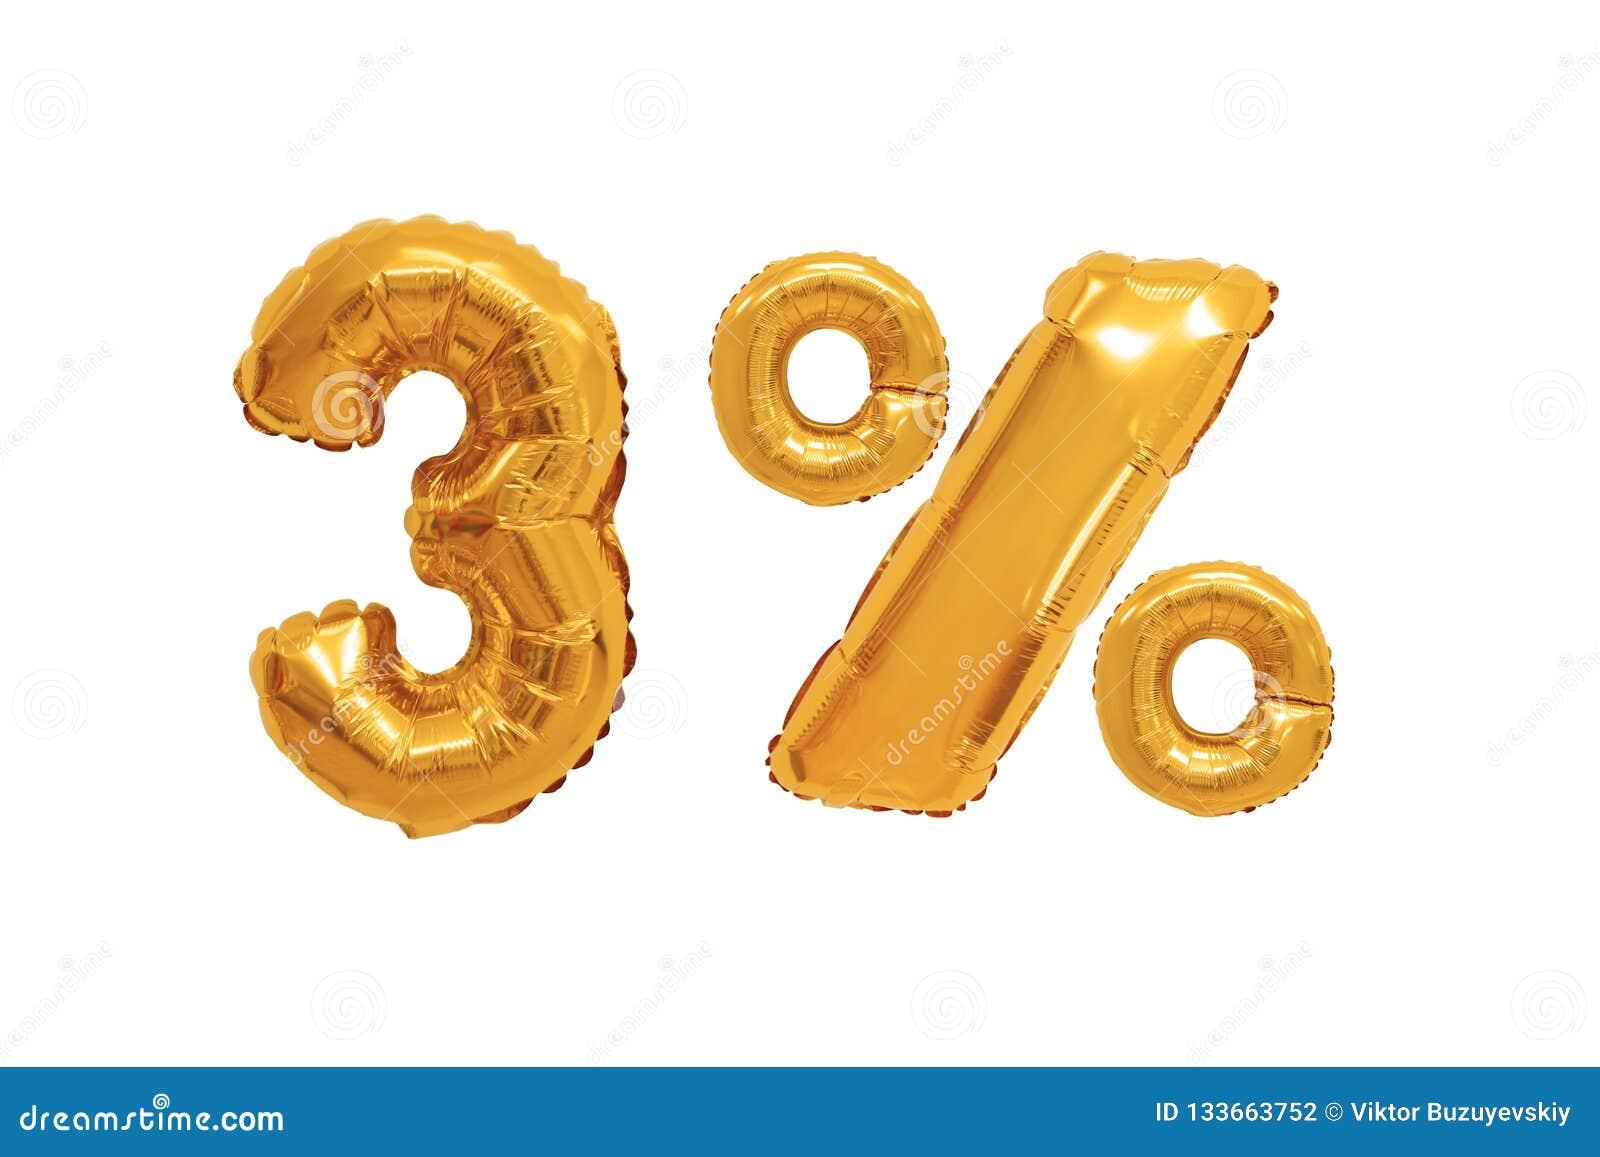 Drie percenten van ballons oranje kleur